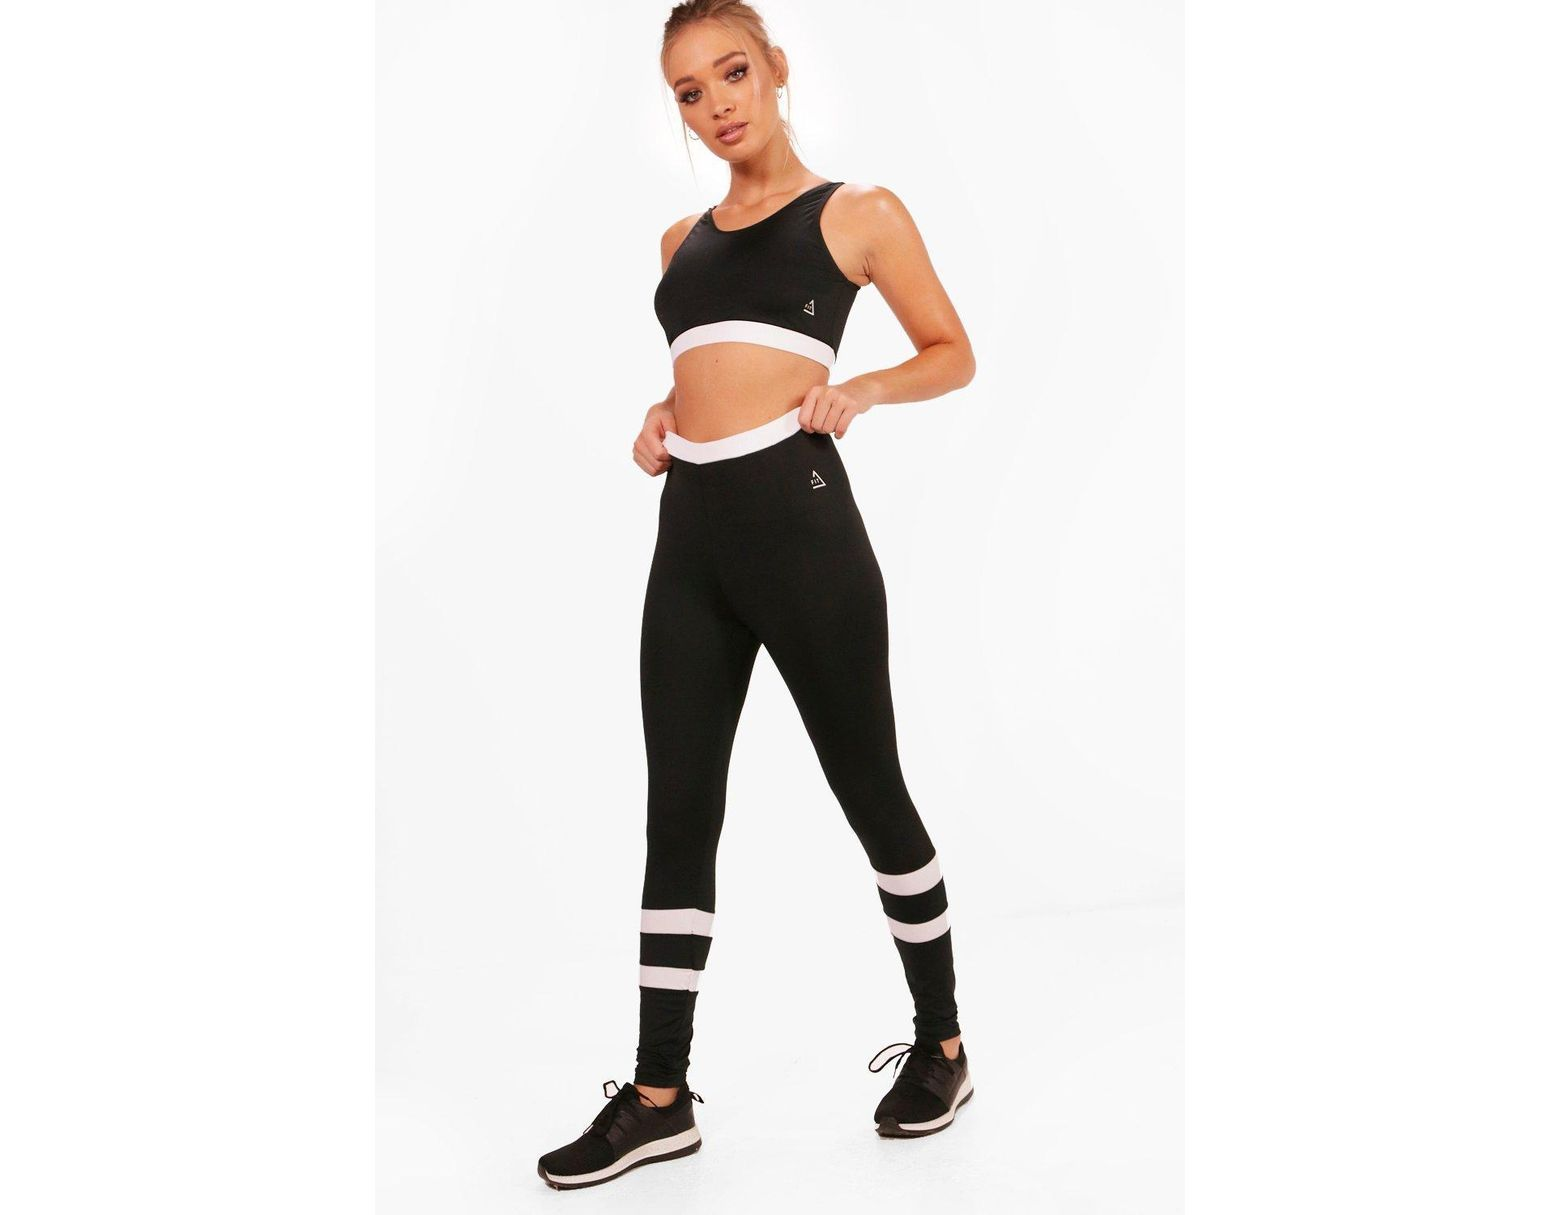 a056f02e10b8c6 Boohoo Fit High Waisted Legging & Sports Bra Set in Black - Lyst